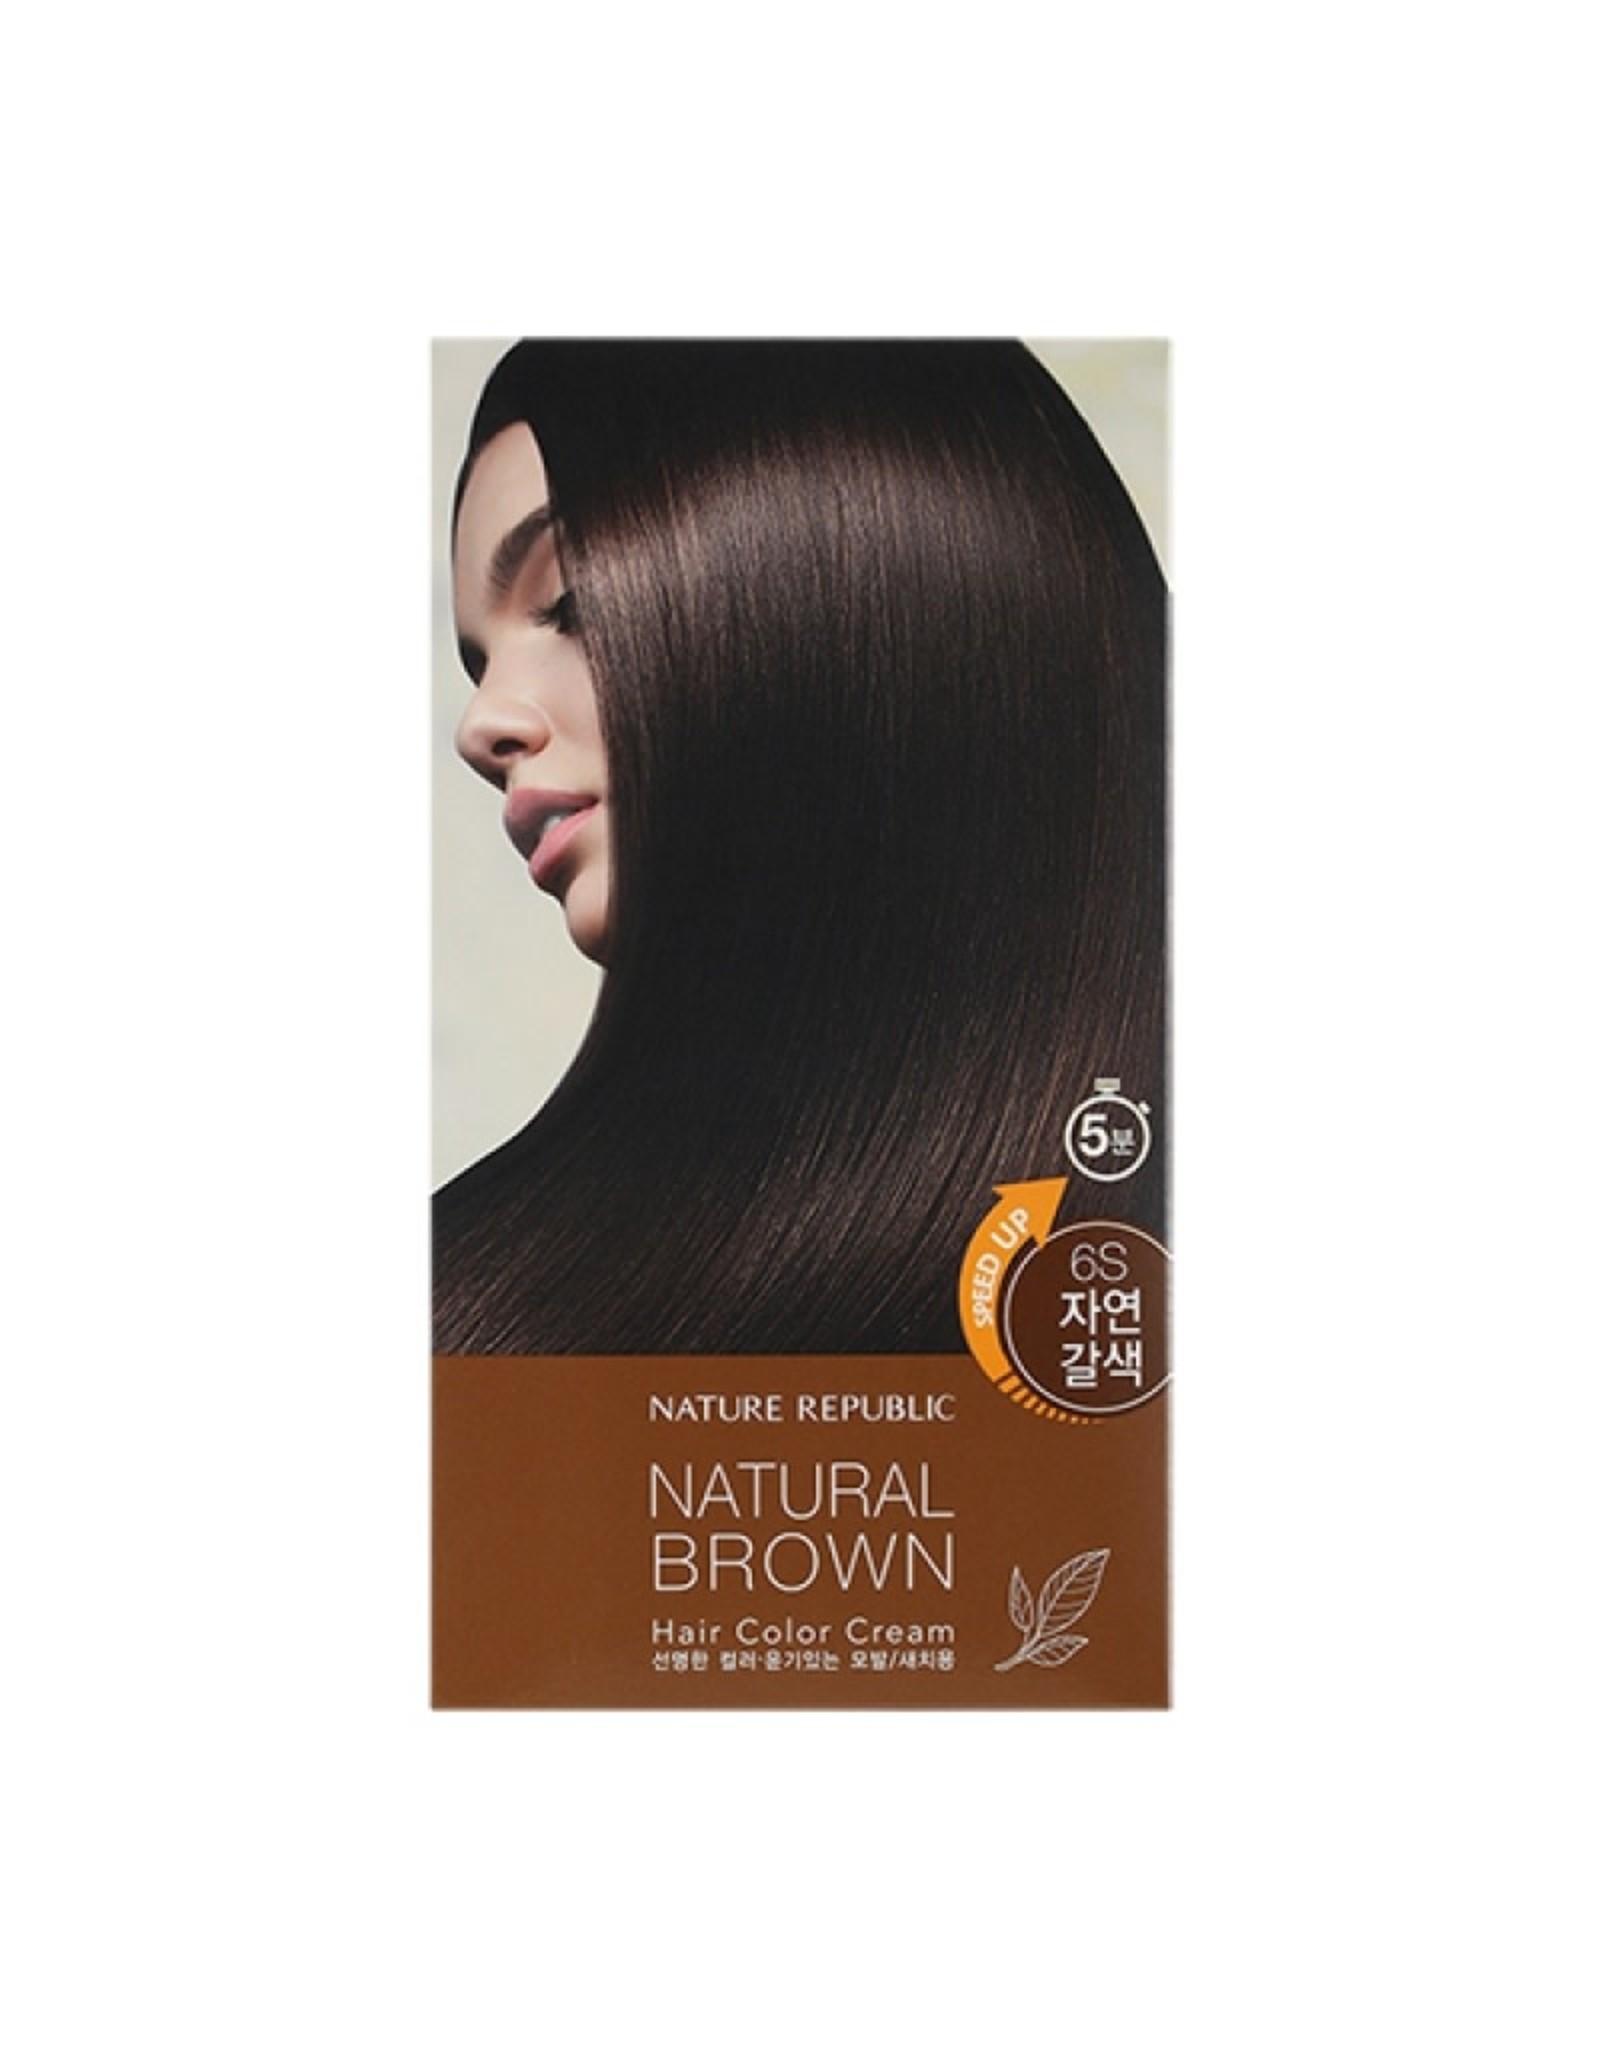 Hair&Nature Hair Color Cream 6S Natural Brown